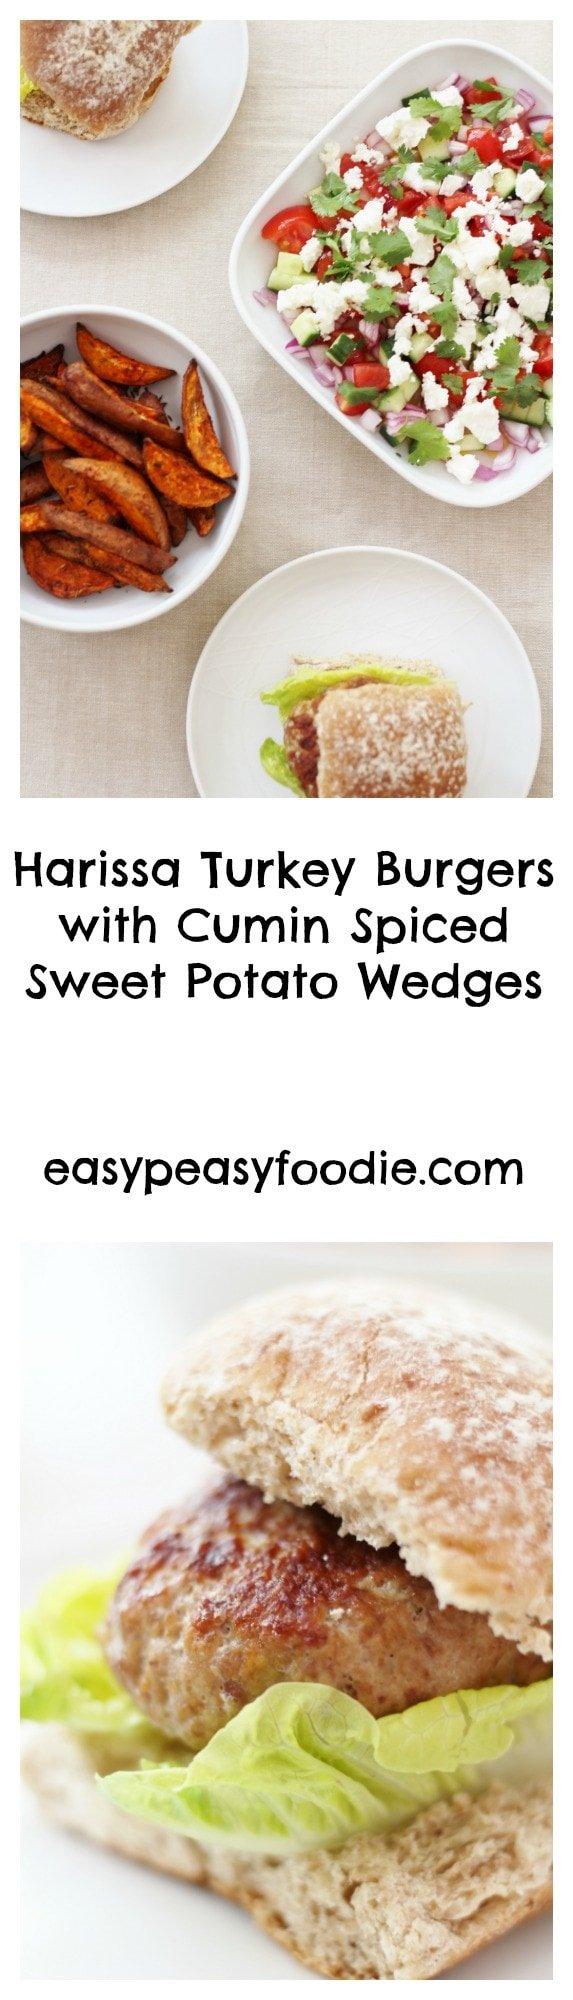 Harissa Turkey Burgers Pinnable image for Pinterest